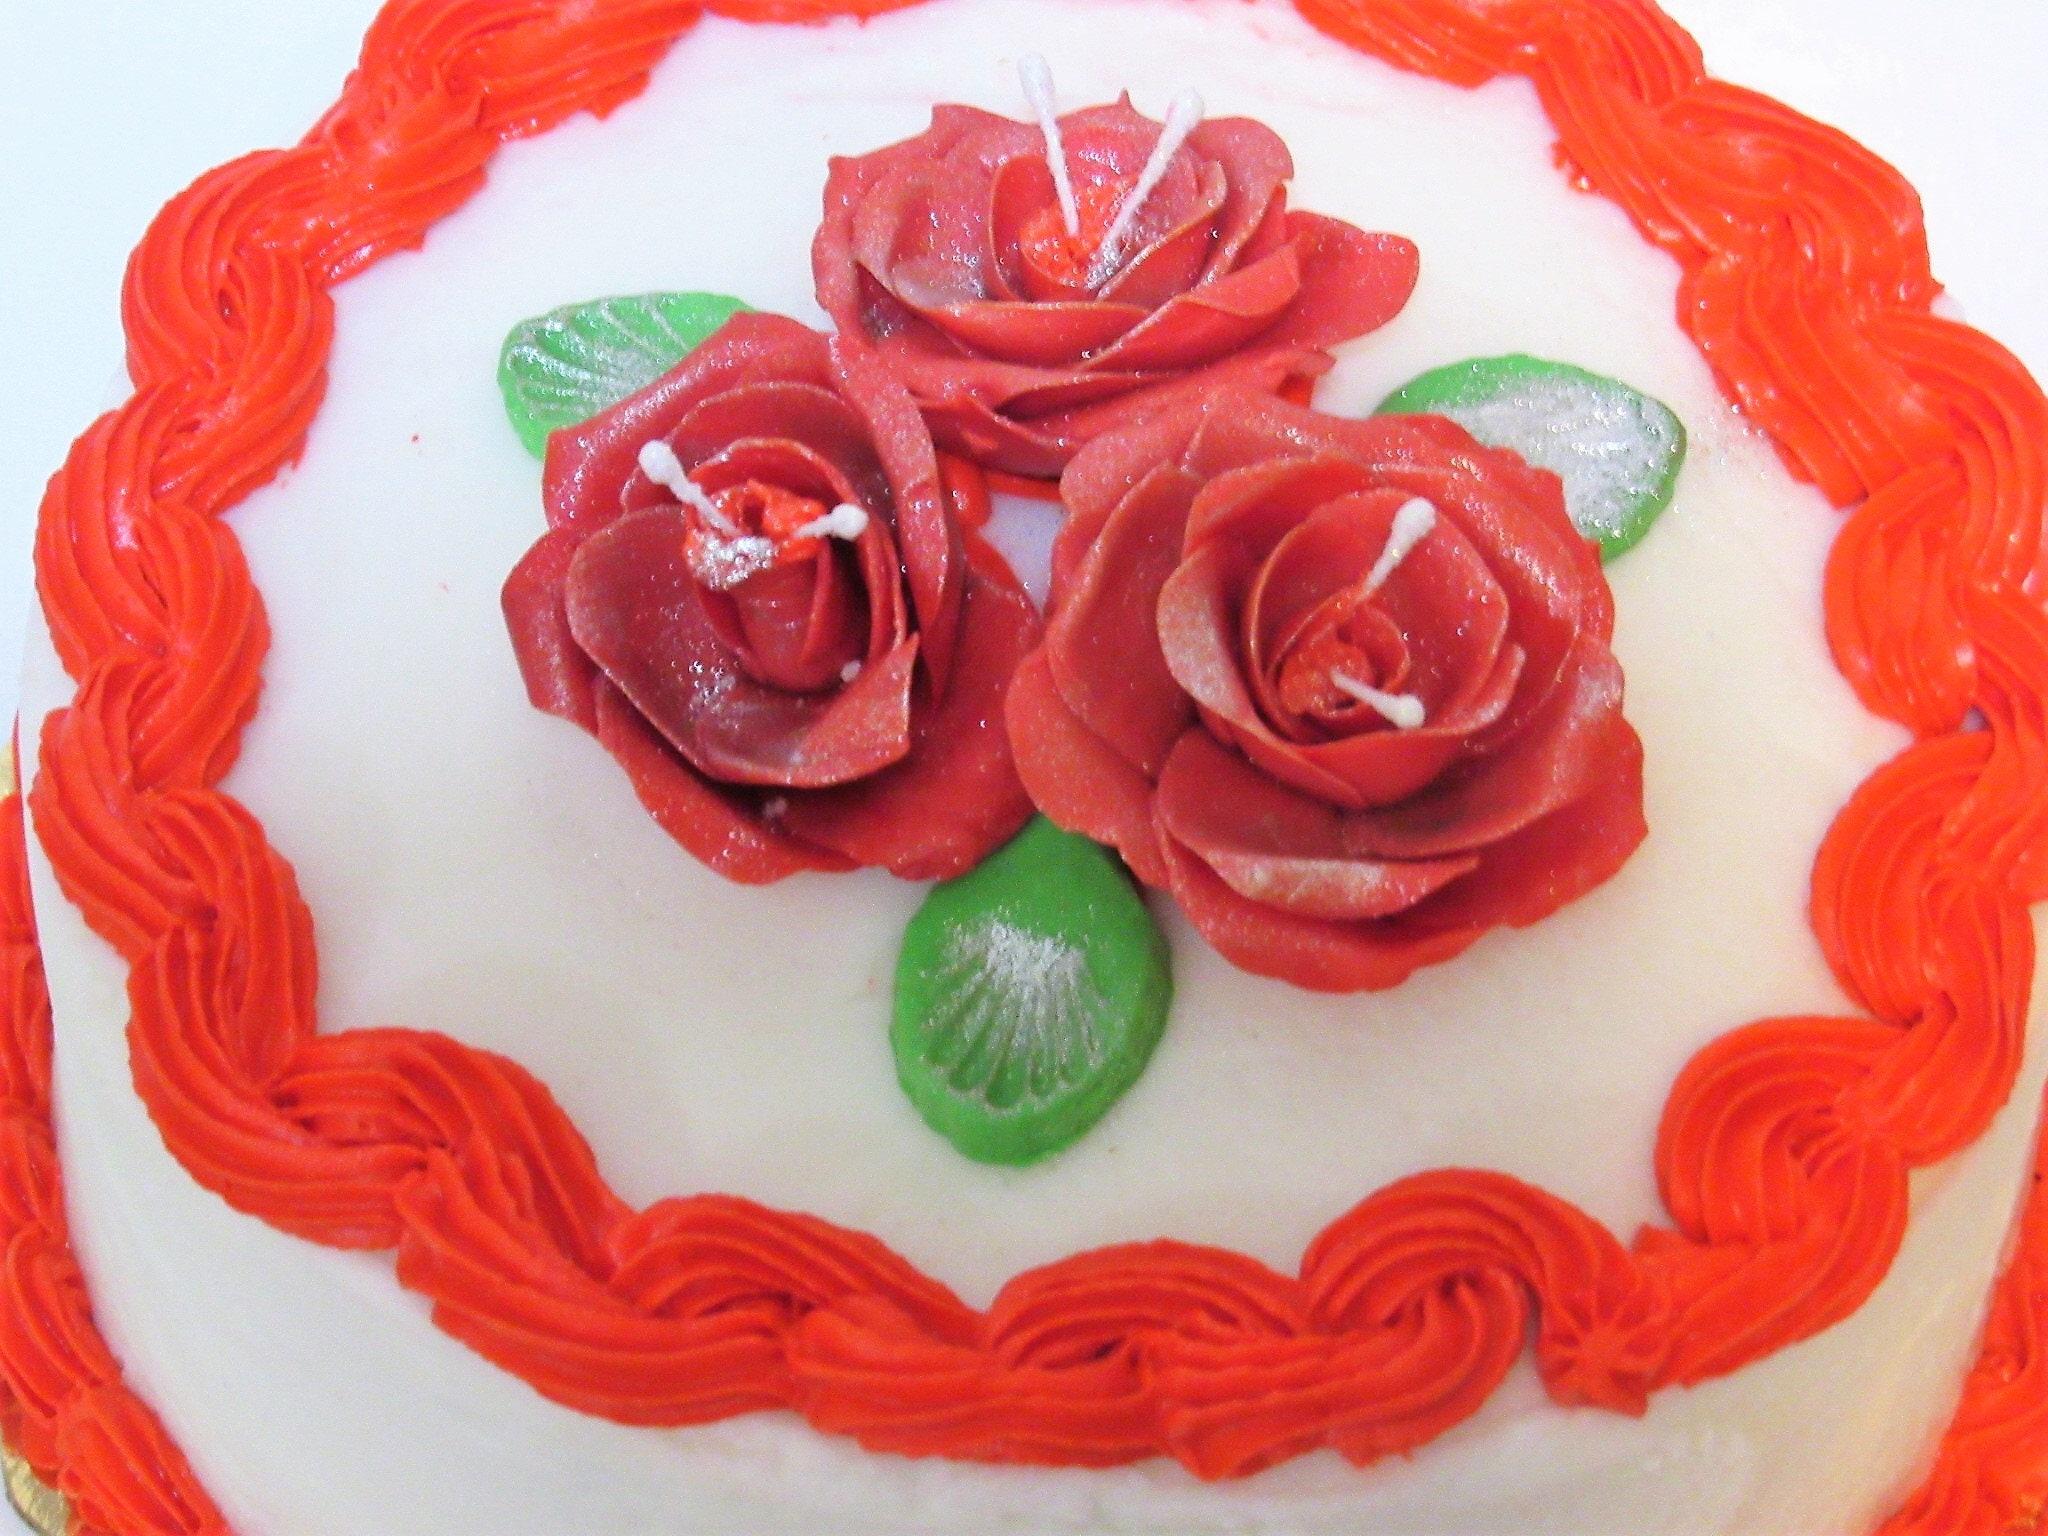 Christmas Cake, Black Cake, Rum Cake or Fruit Cake, with Royal Icing